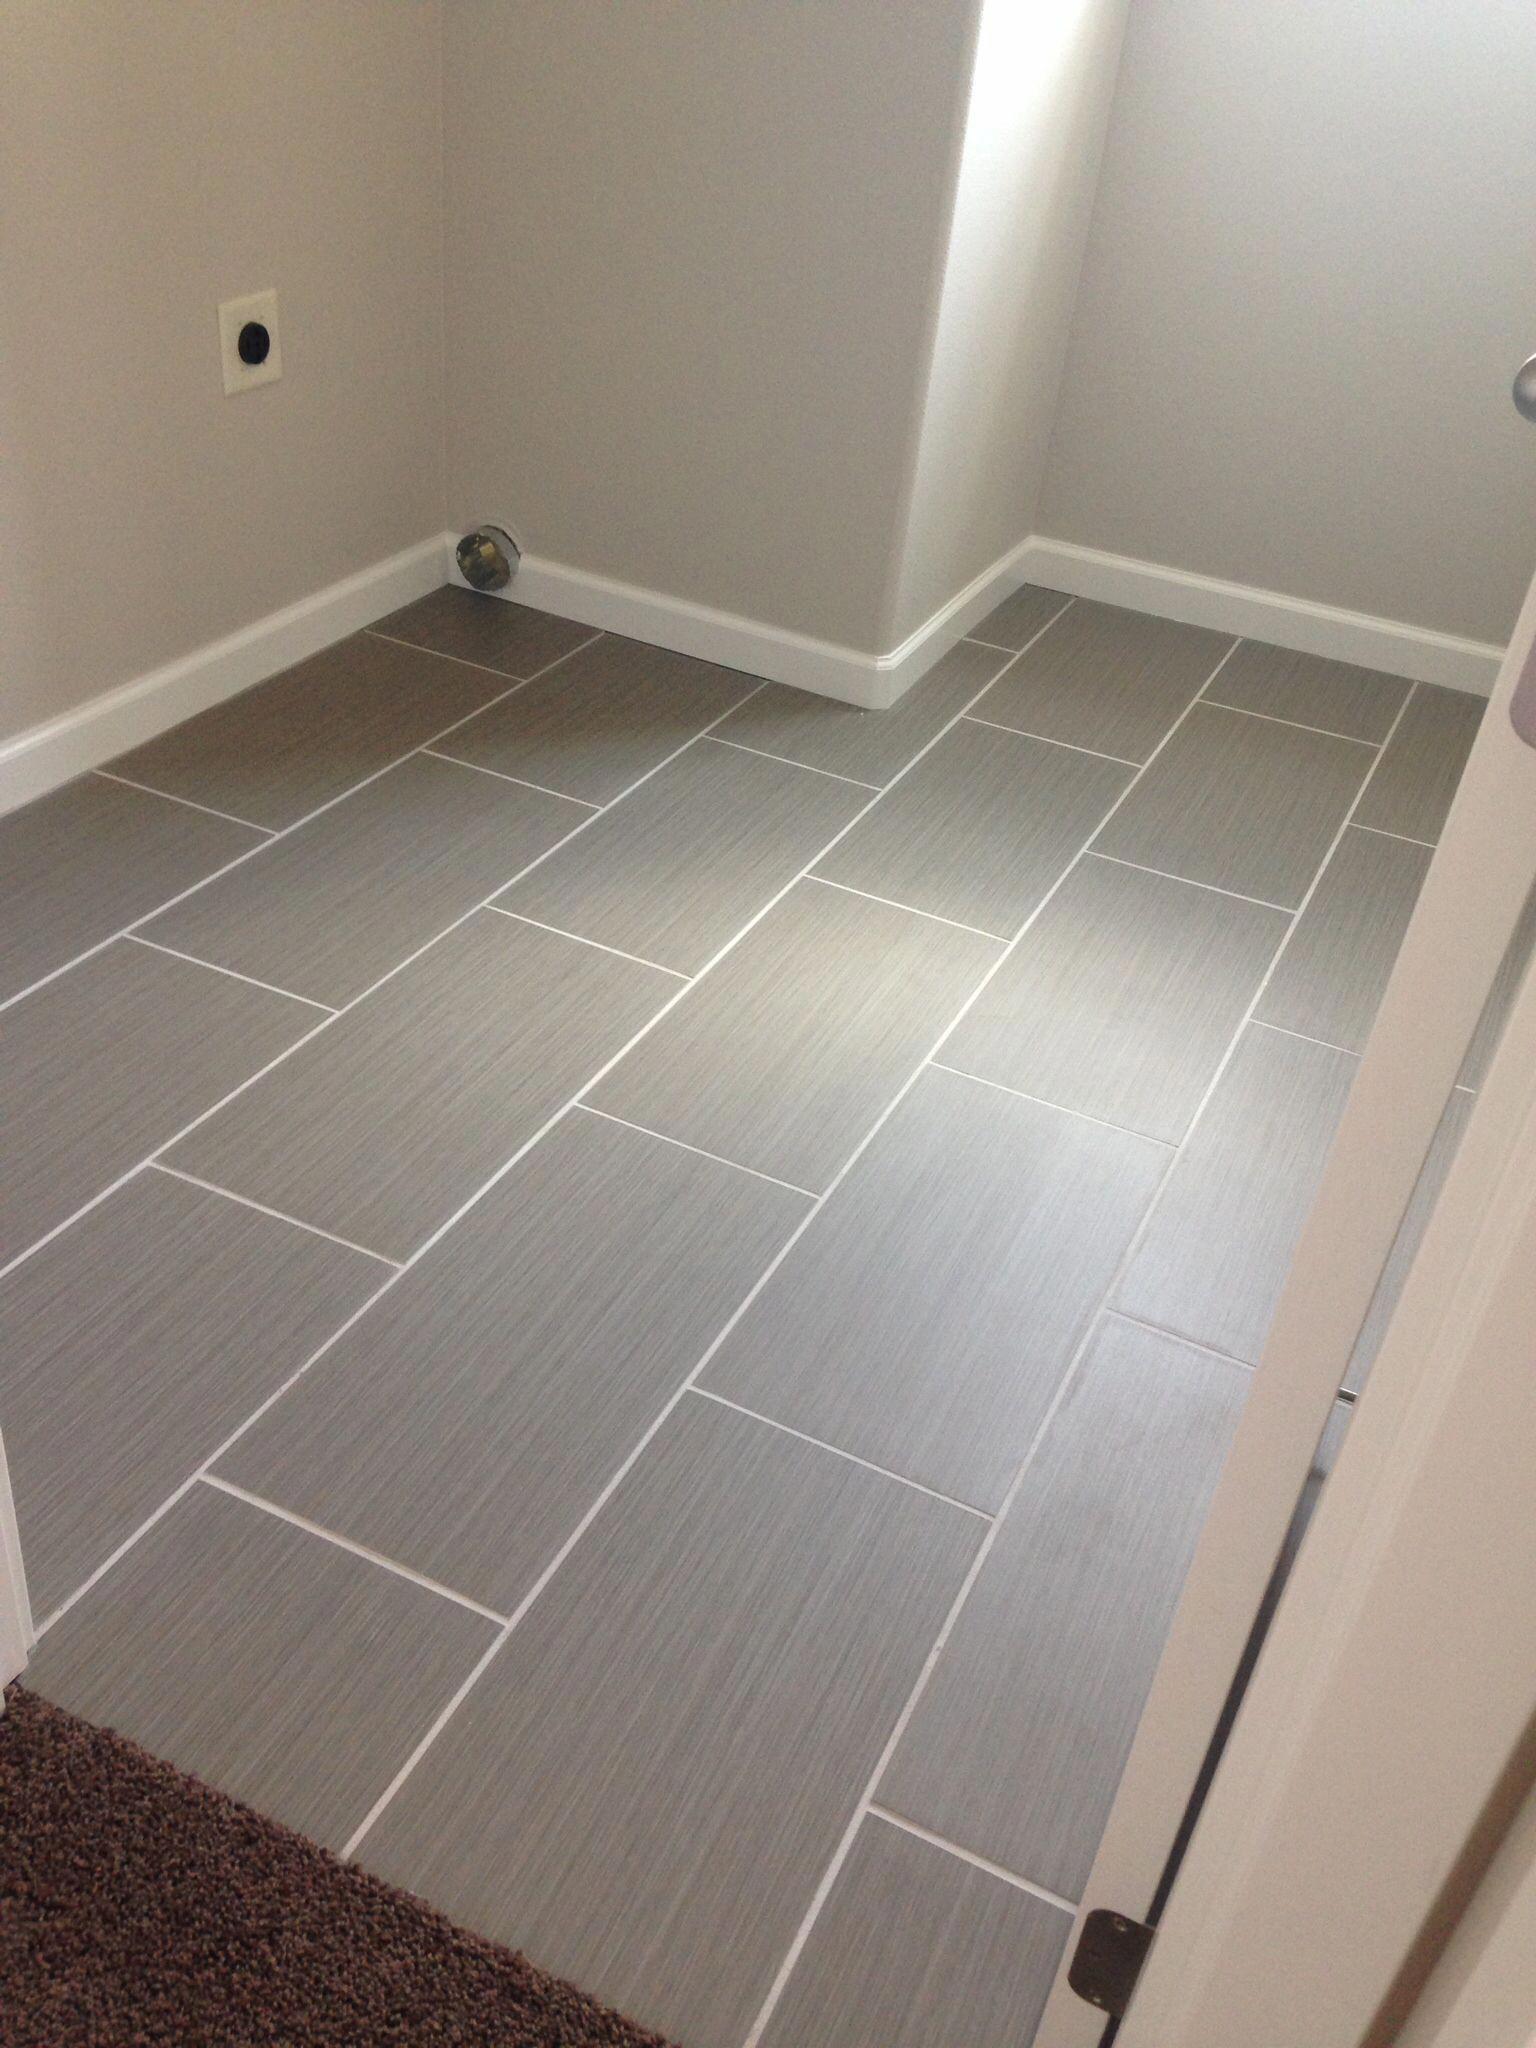 Why Not Try These Out For Info Bathroom Decoration Ideas Grey Bathroom Floor Creative Bathroom Design Grey Floor Tiles